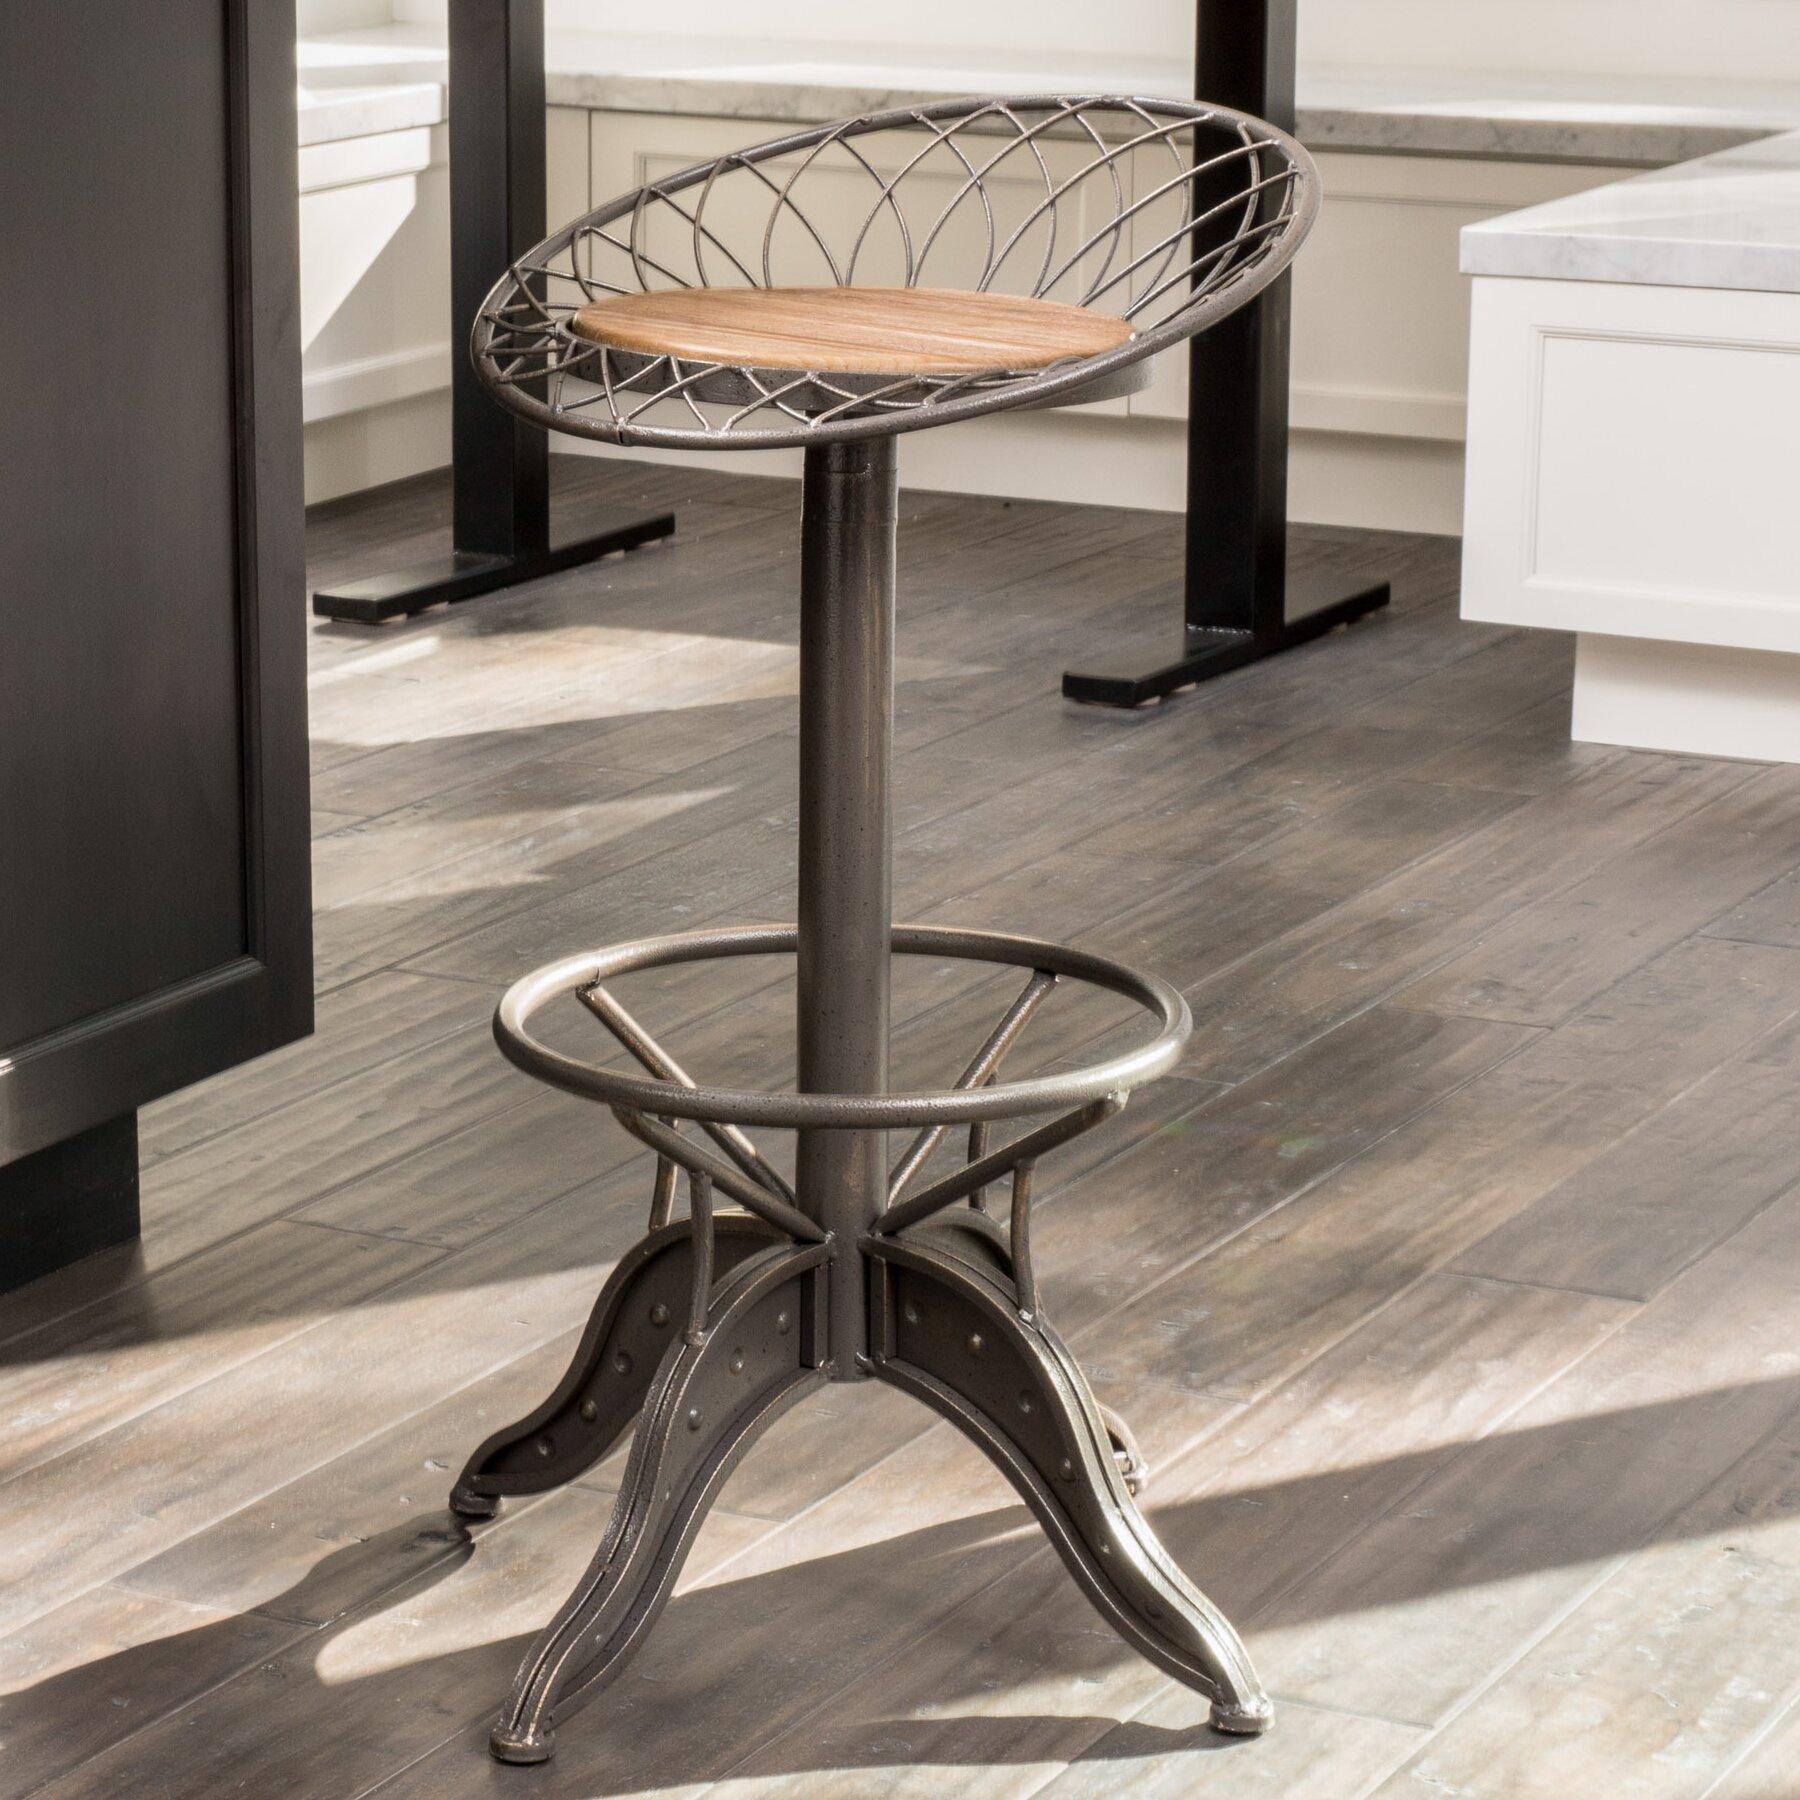 adjustable height swivel bar stool wayfair. Black Bedroom Furniture Sets. Home Design Ideas